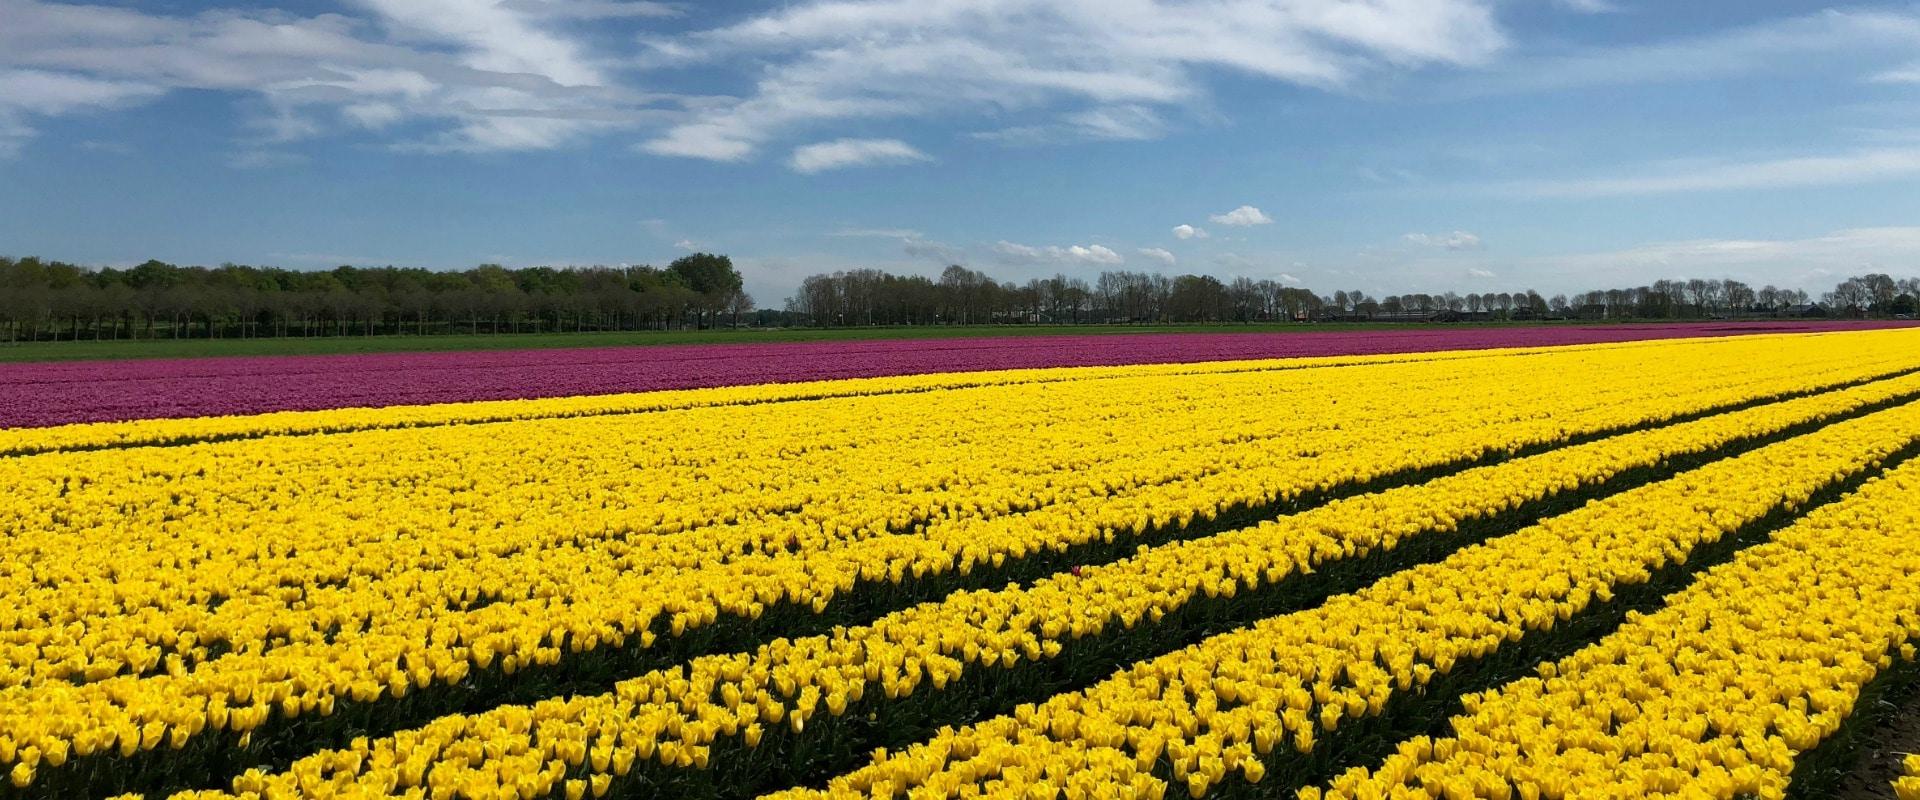 Sea of color at Tulip Tours Holland Venhuizen